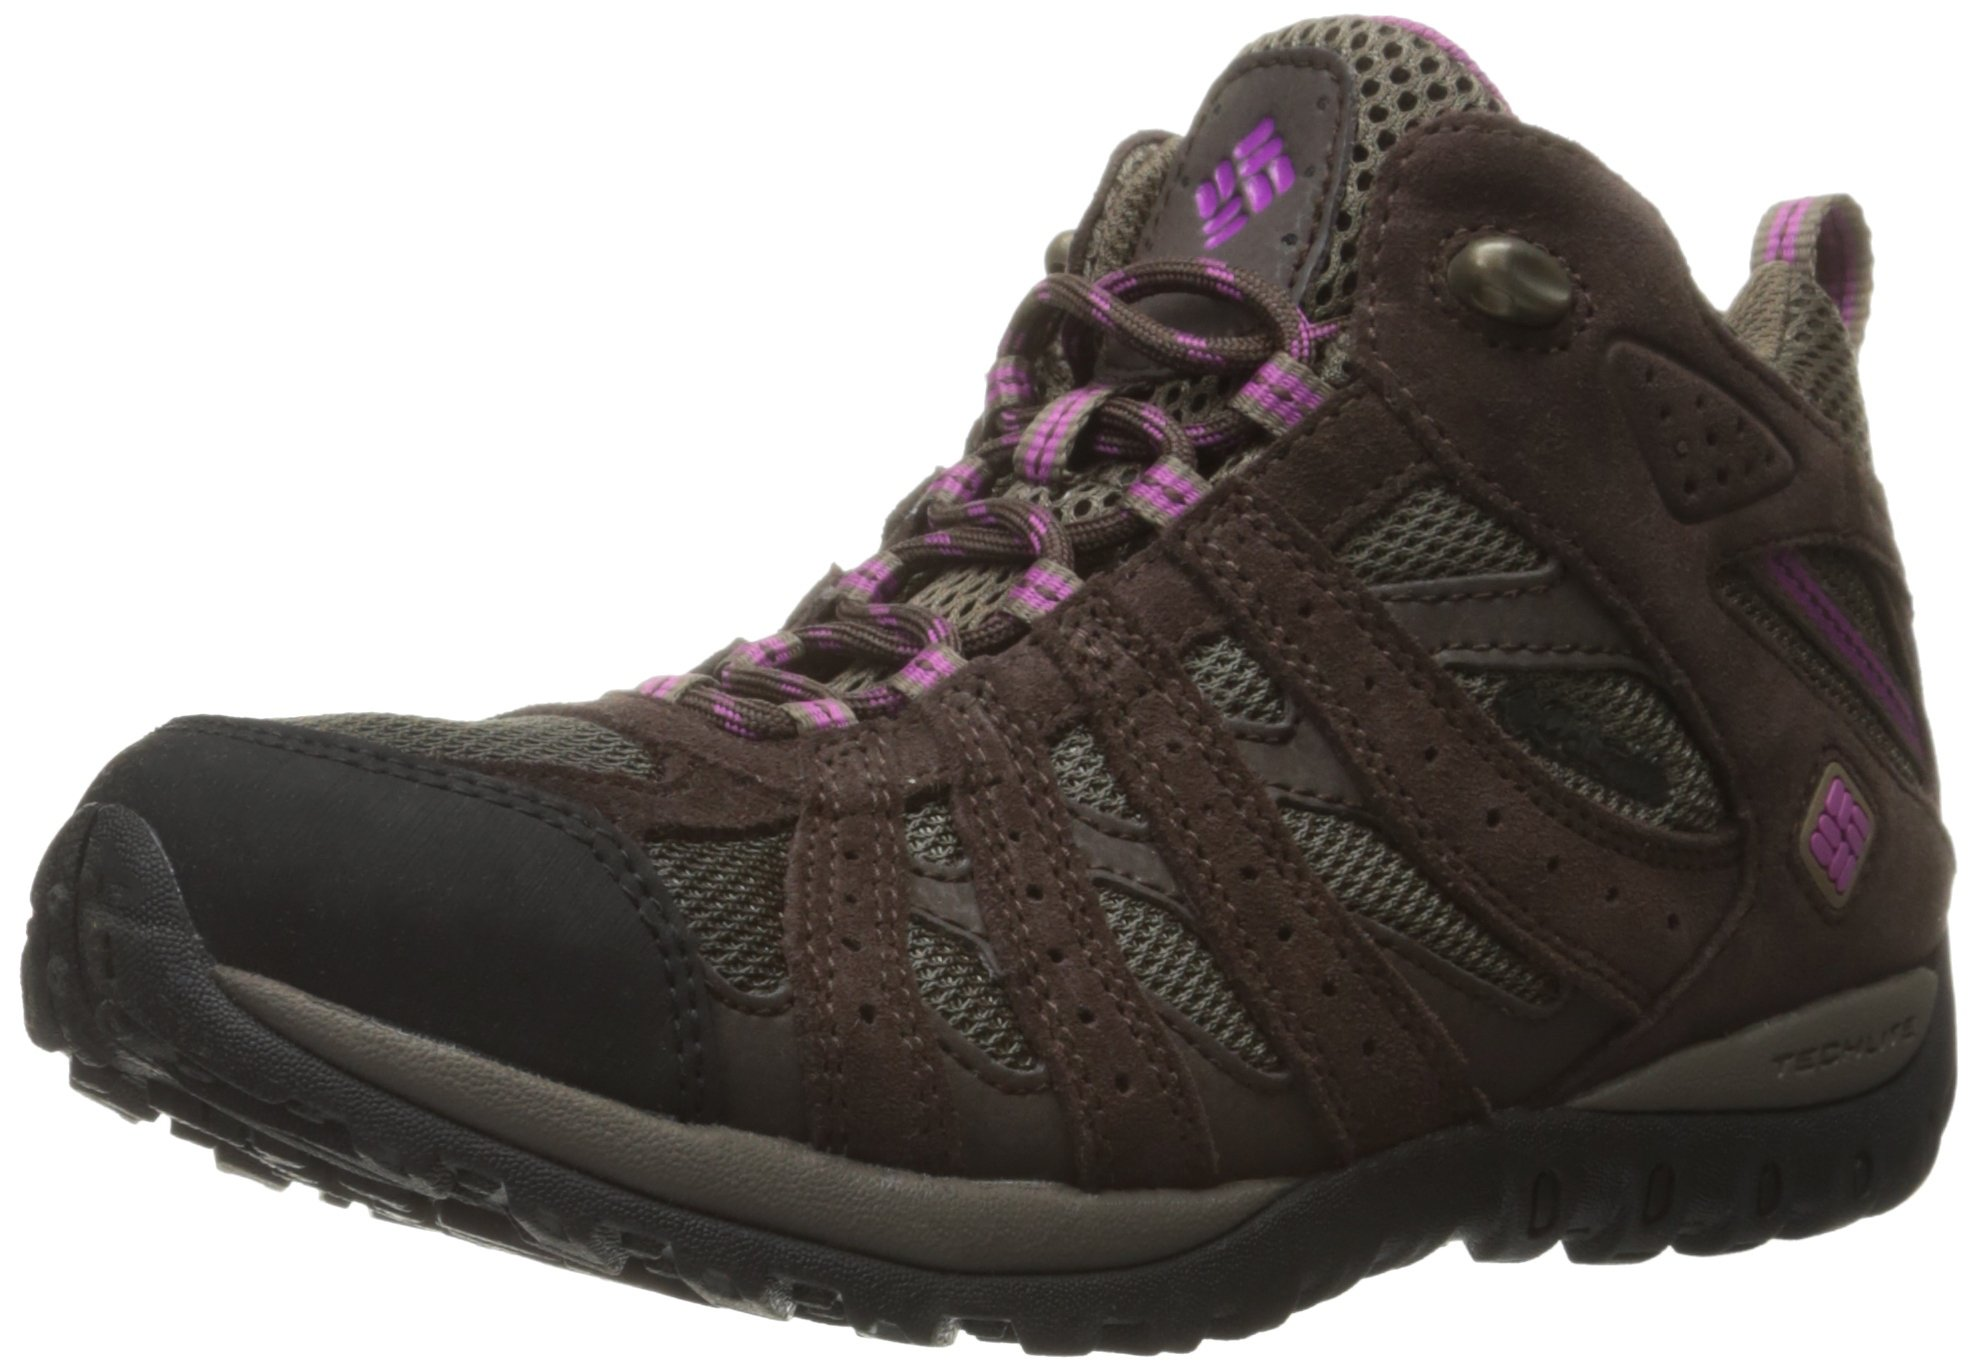 Columbia Women's Redmond Waterproof Mid Hiking Boots, Mud/Intense Violet, 9 B US